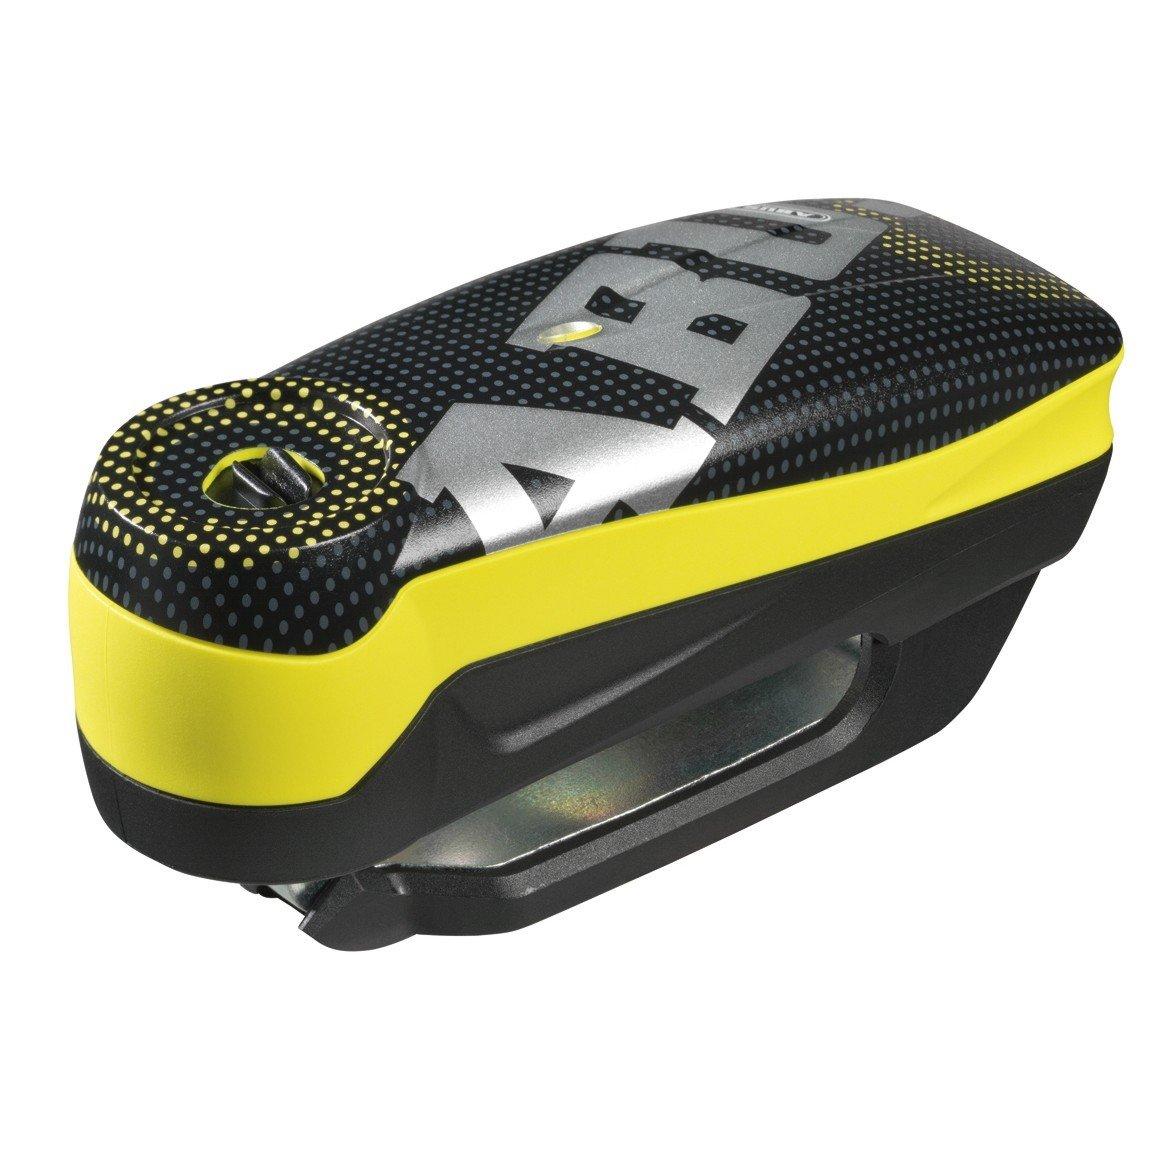 Abus Detecto 7000 RS1 Pixel Yellow